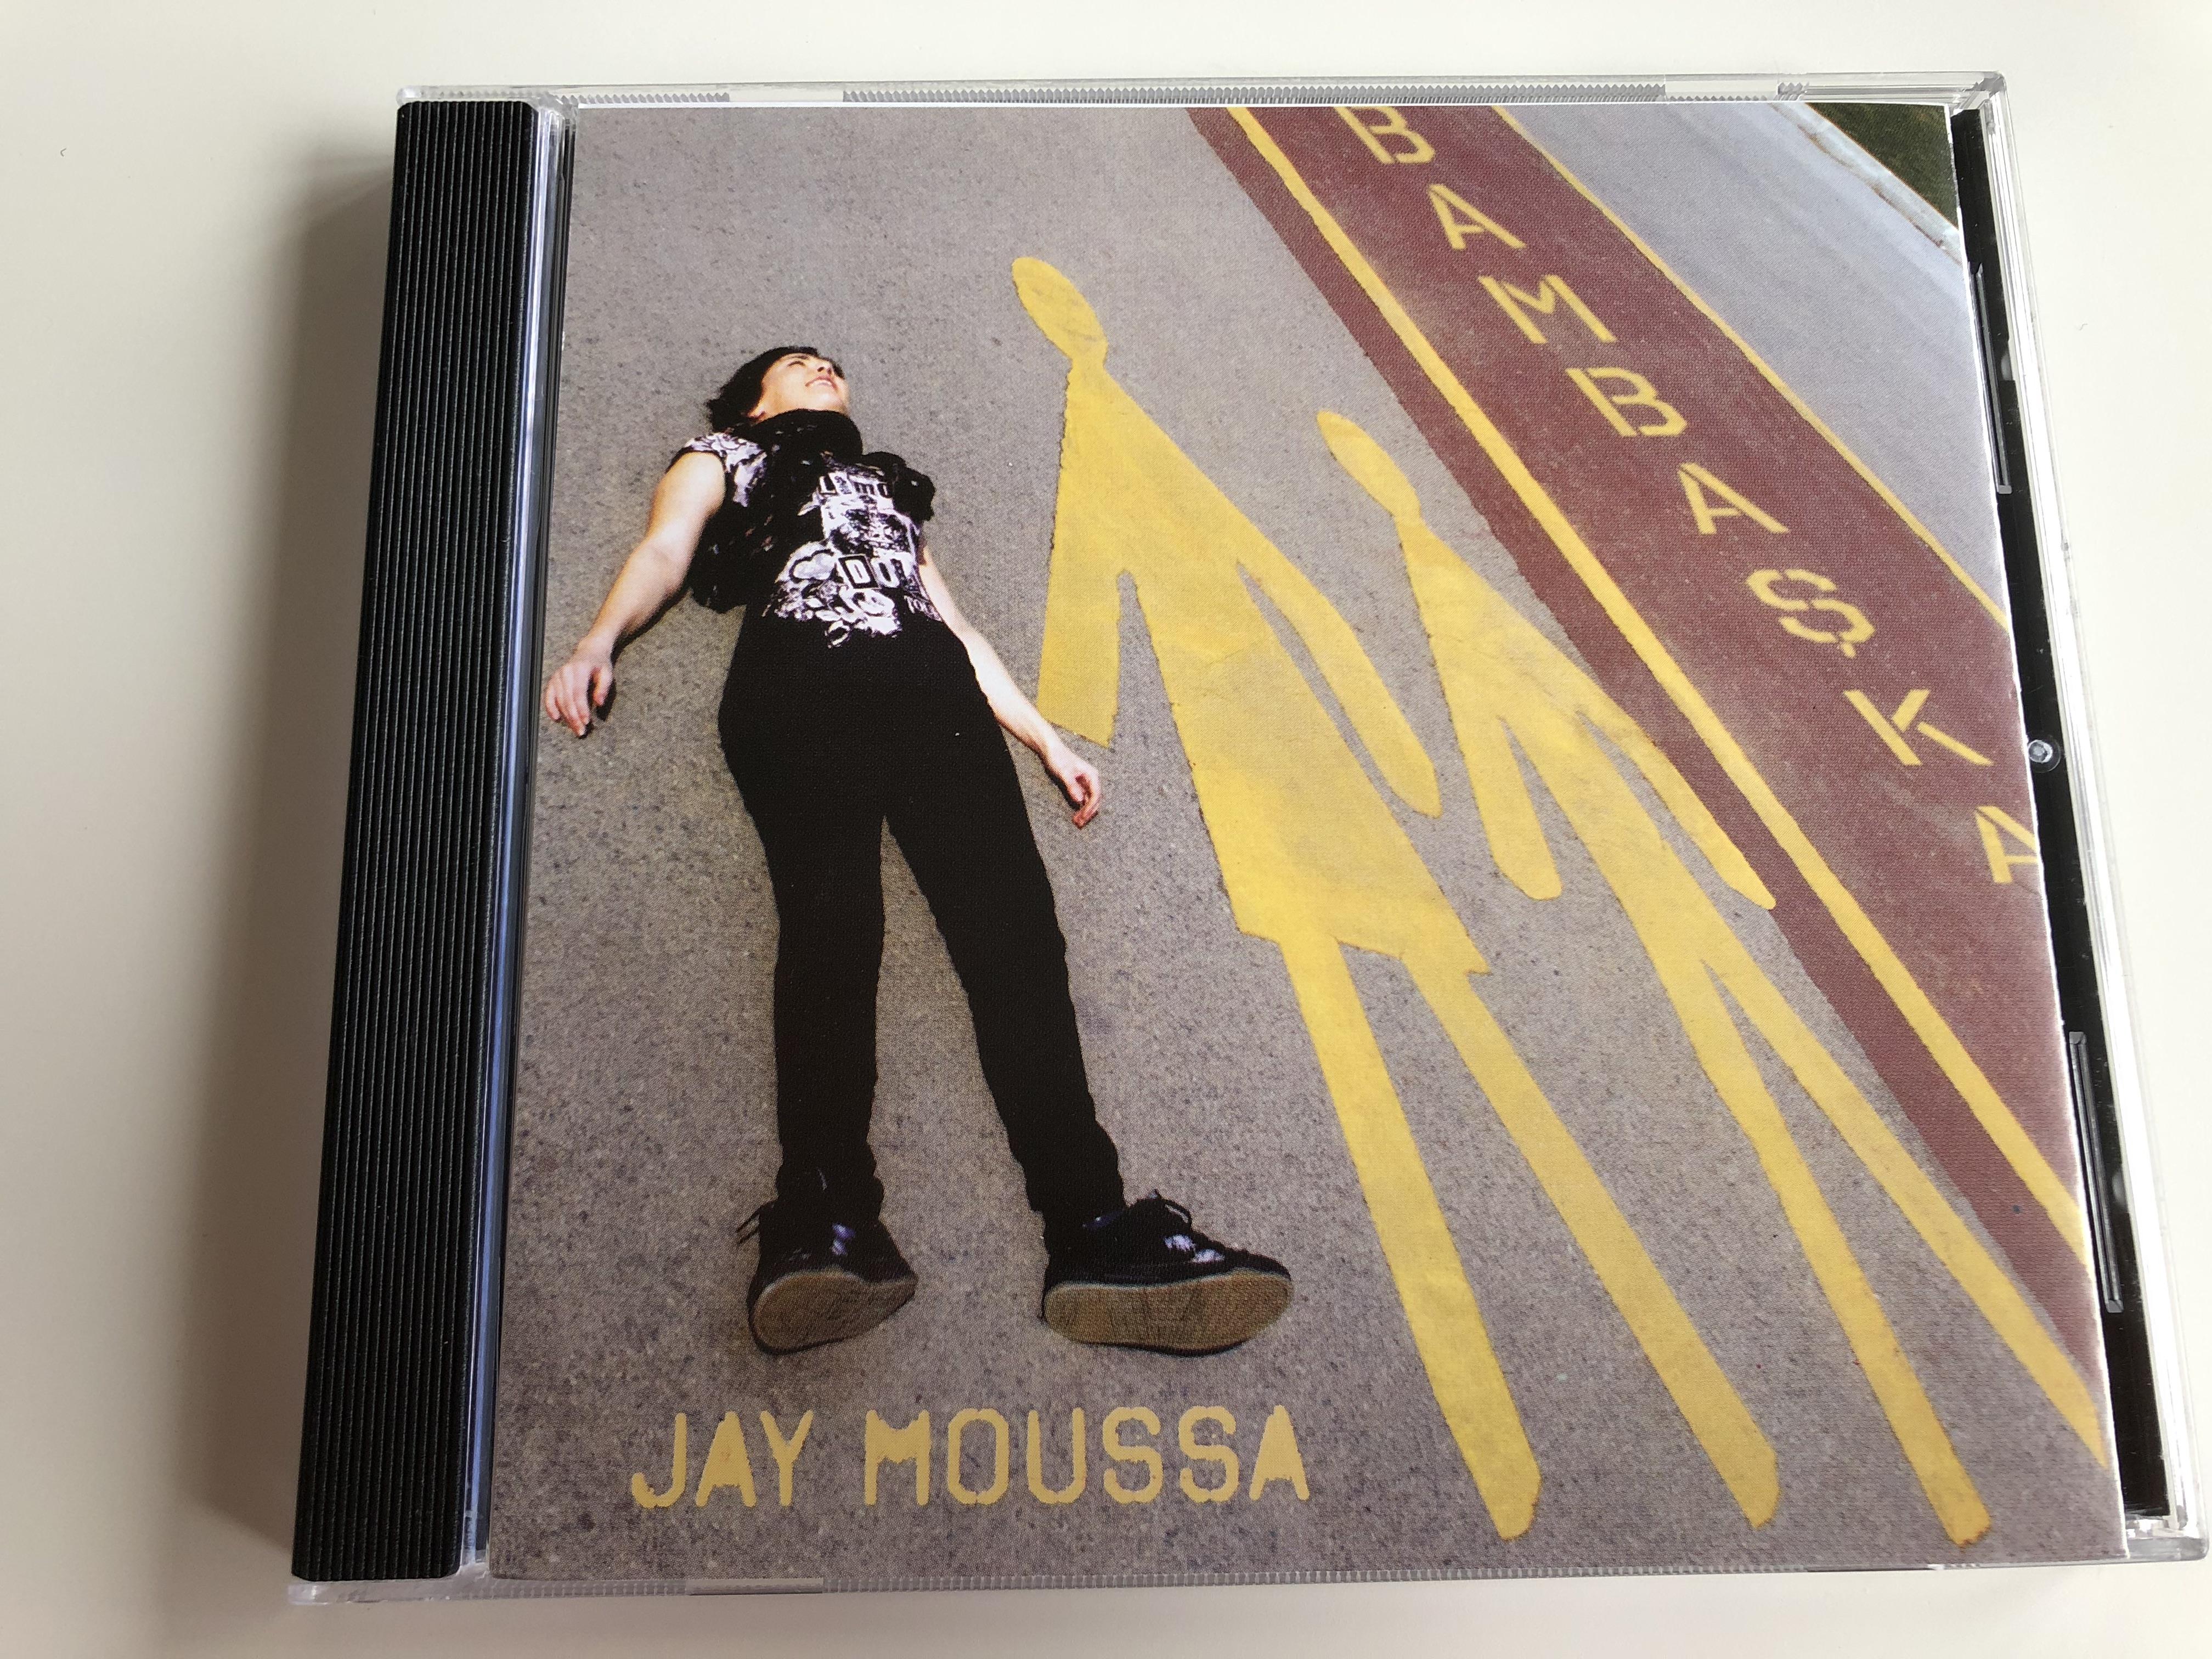 bamba-ka-jay-moussa-turkish-cd-totally-different-1-.jpg